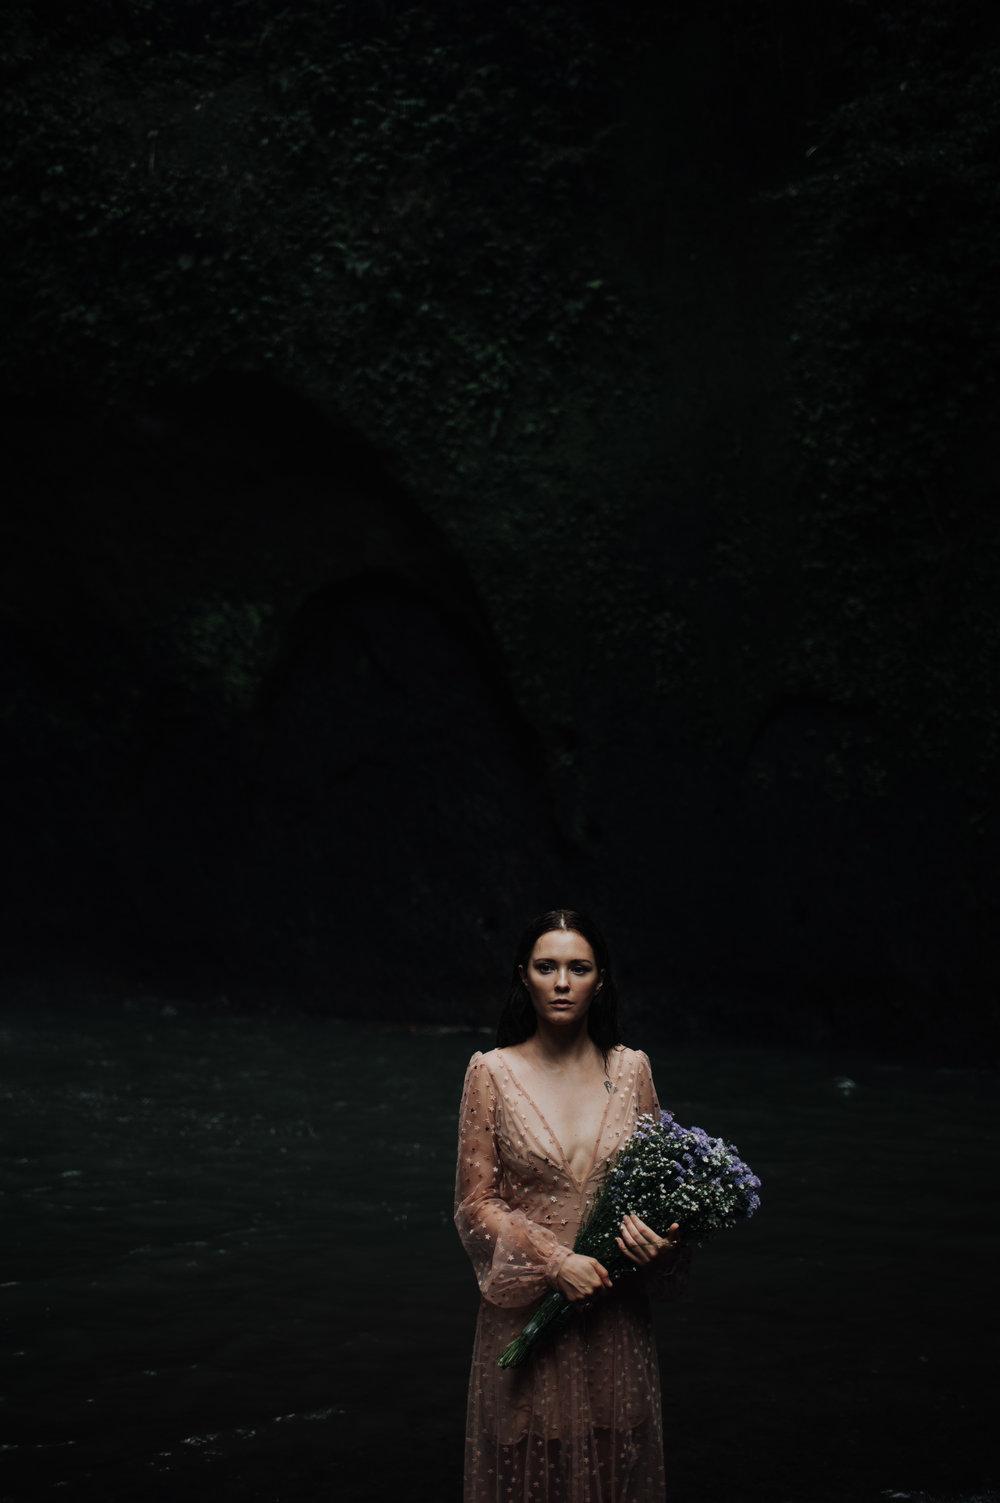 nadiagunnarphotography